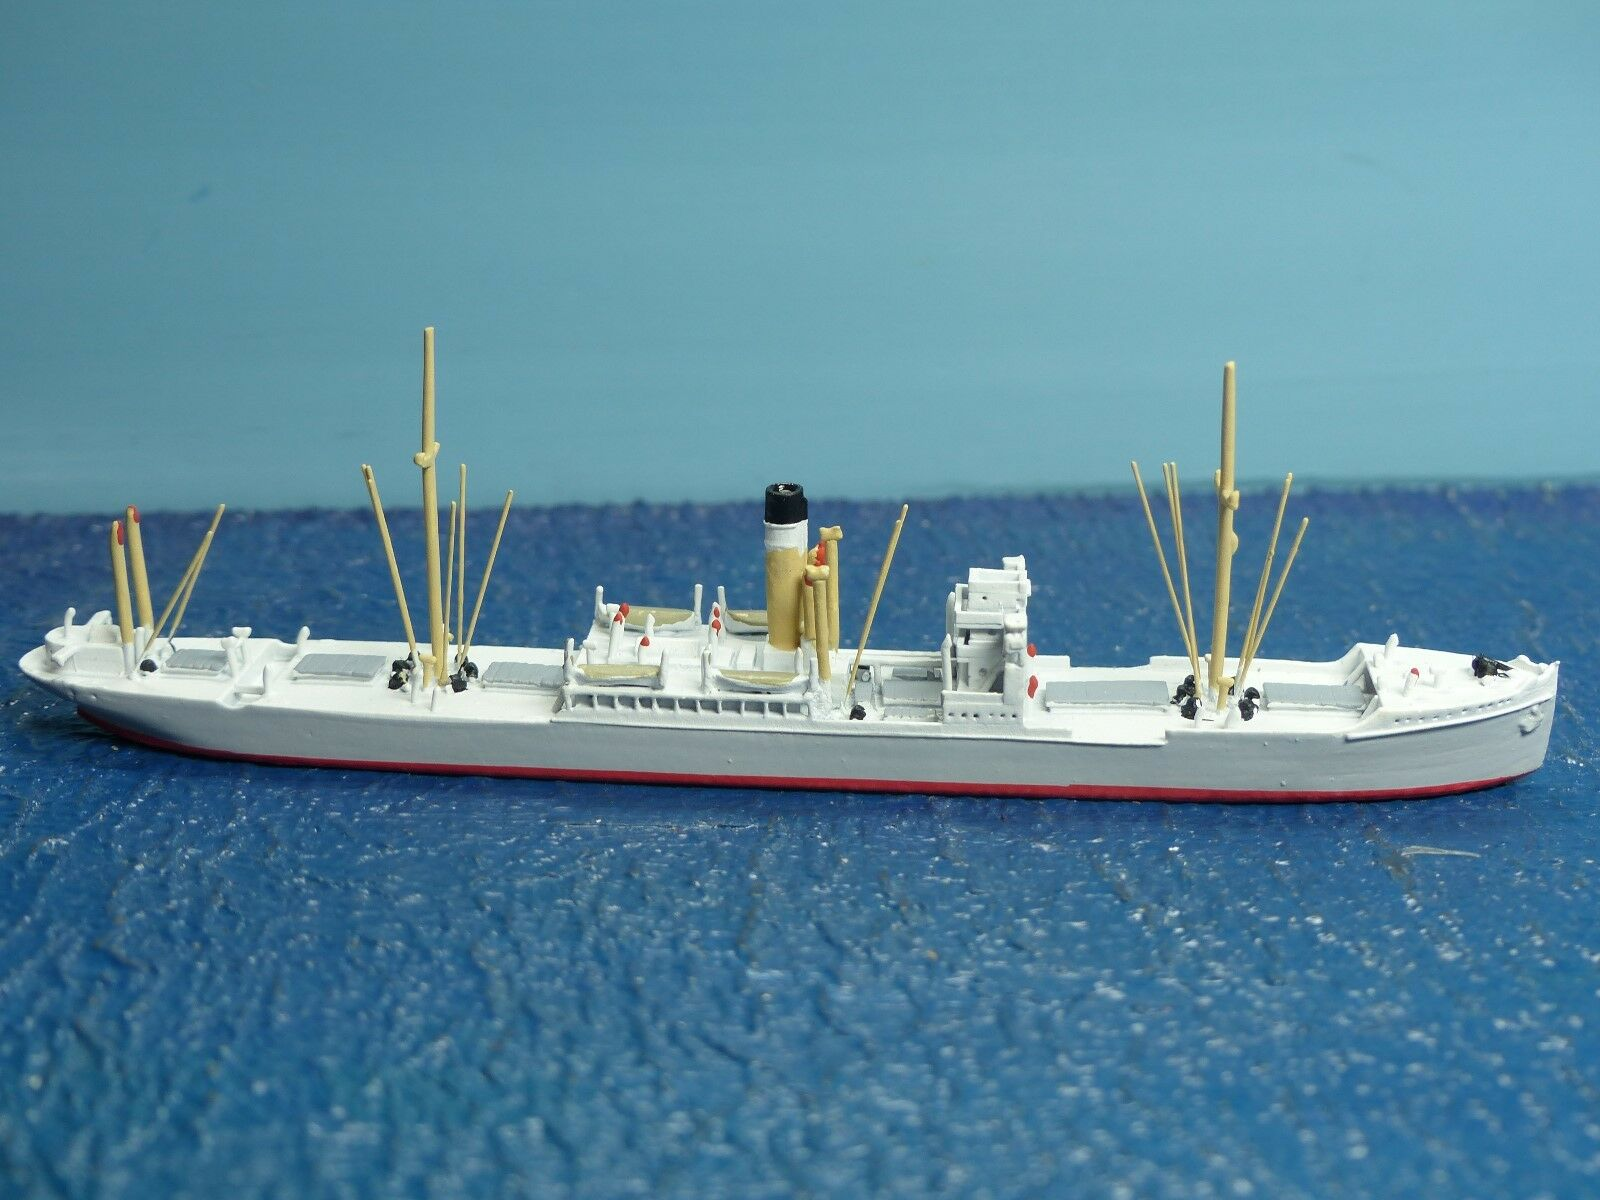 Nave cm 1 1250 GB. nave da trasporto  City of Westminster  cm 400 OVP novità